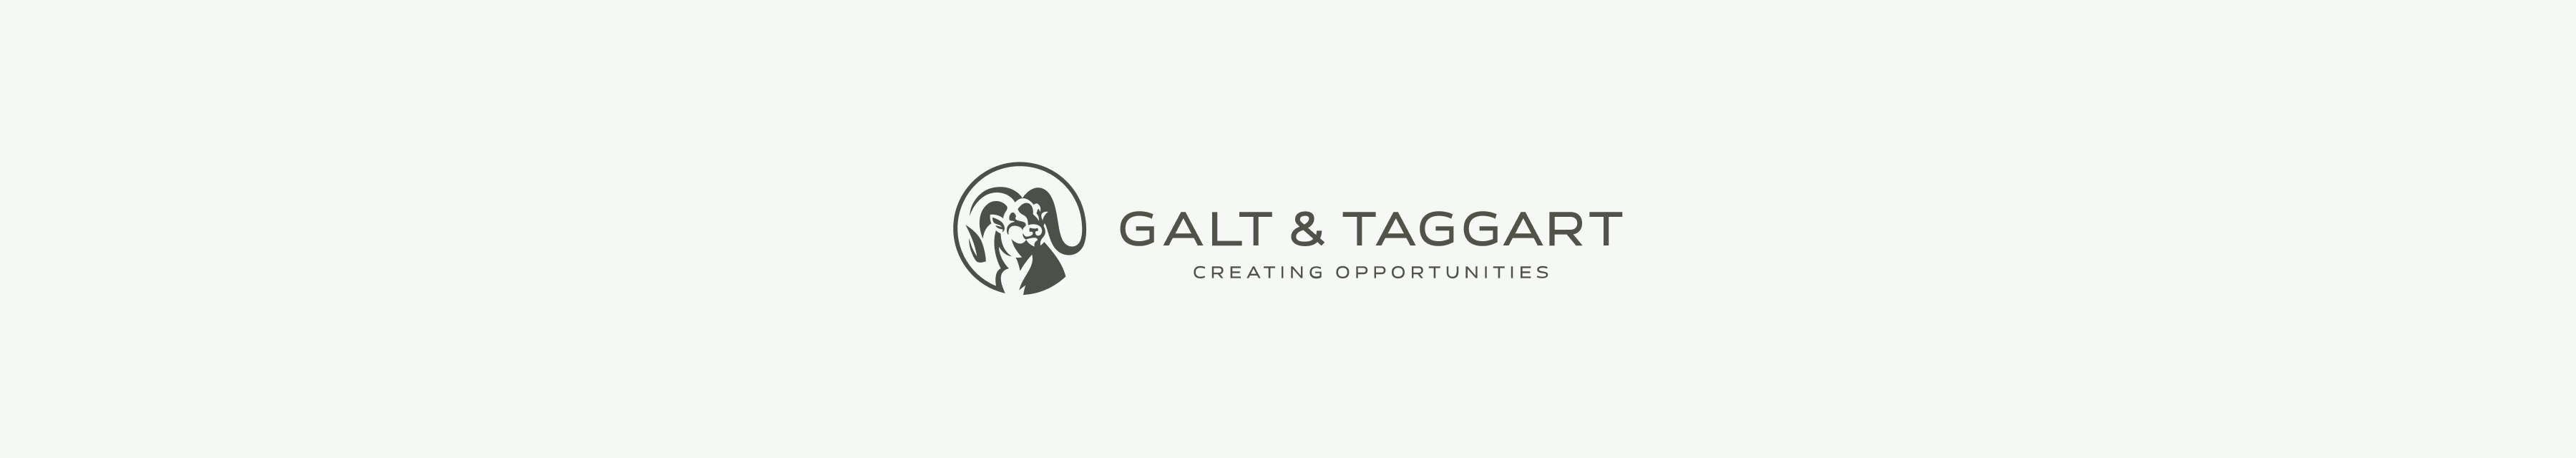 Galt & Taggart